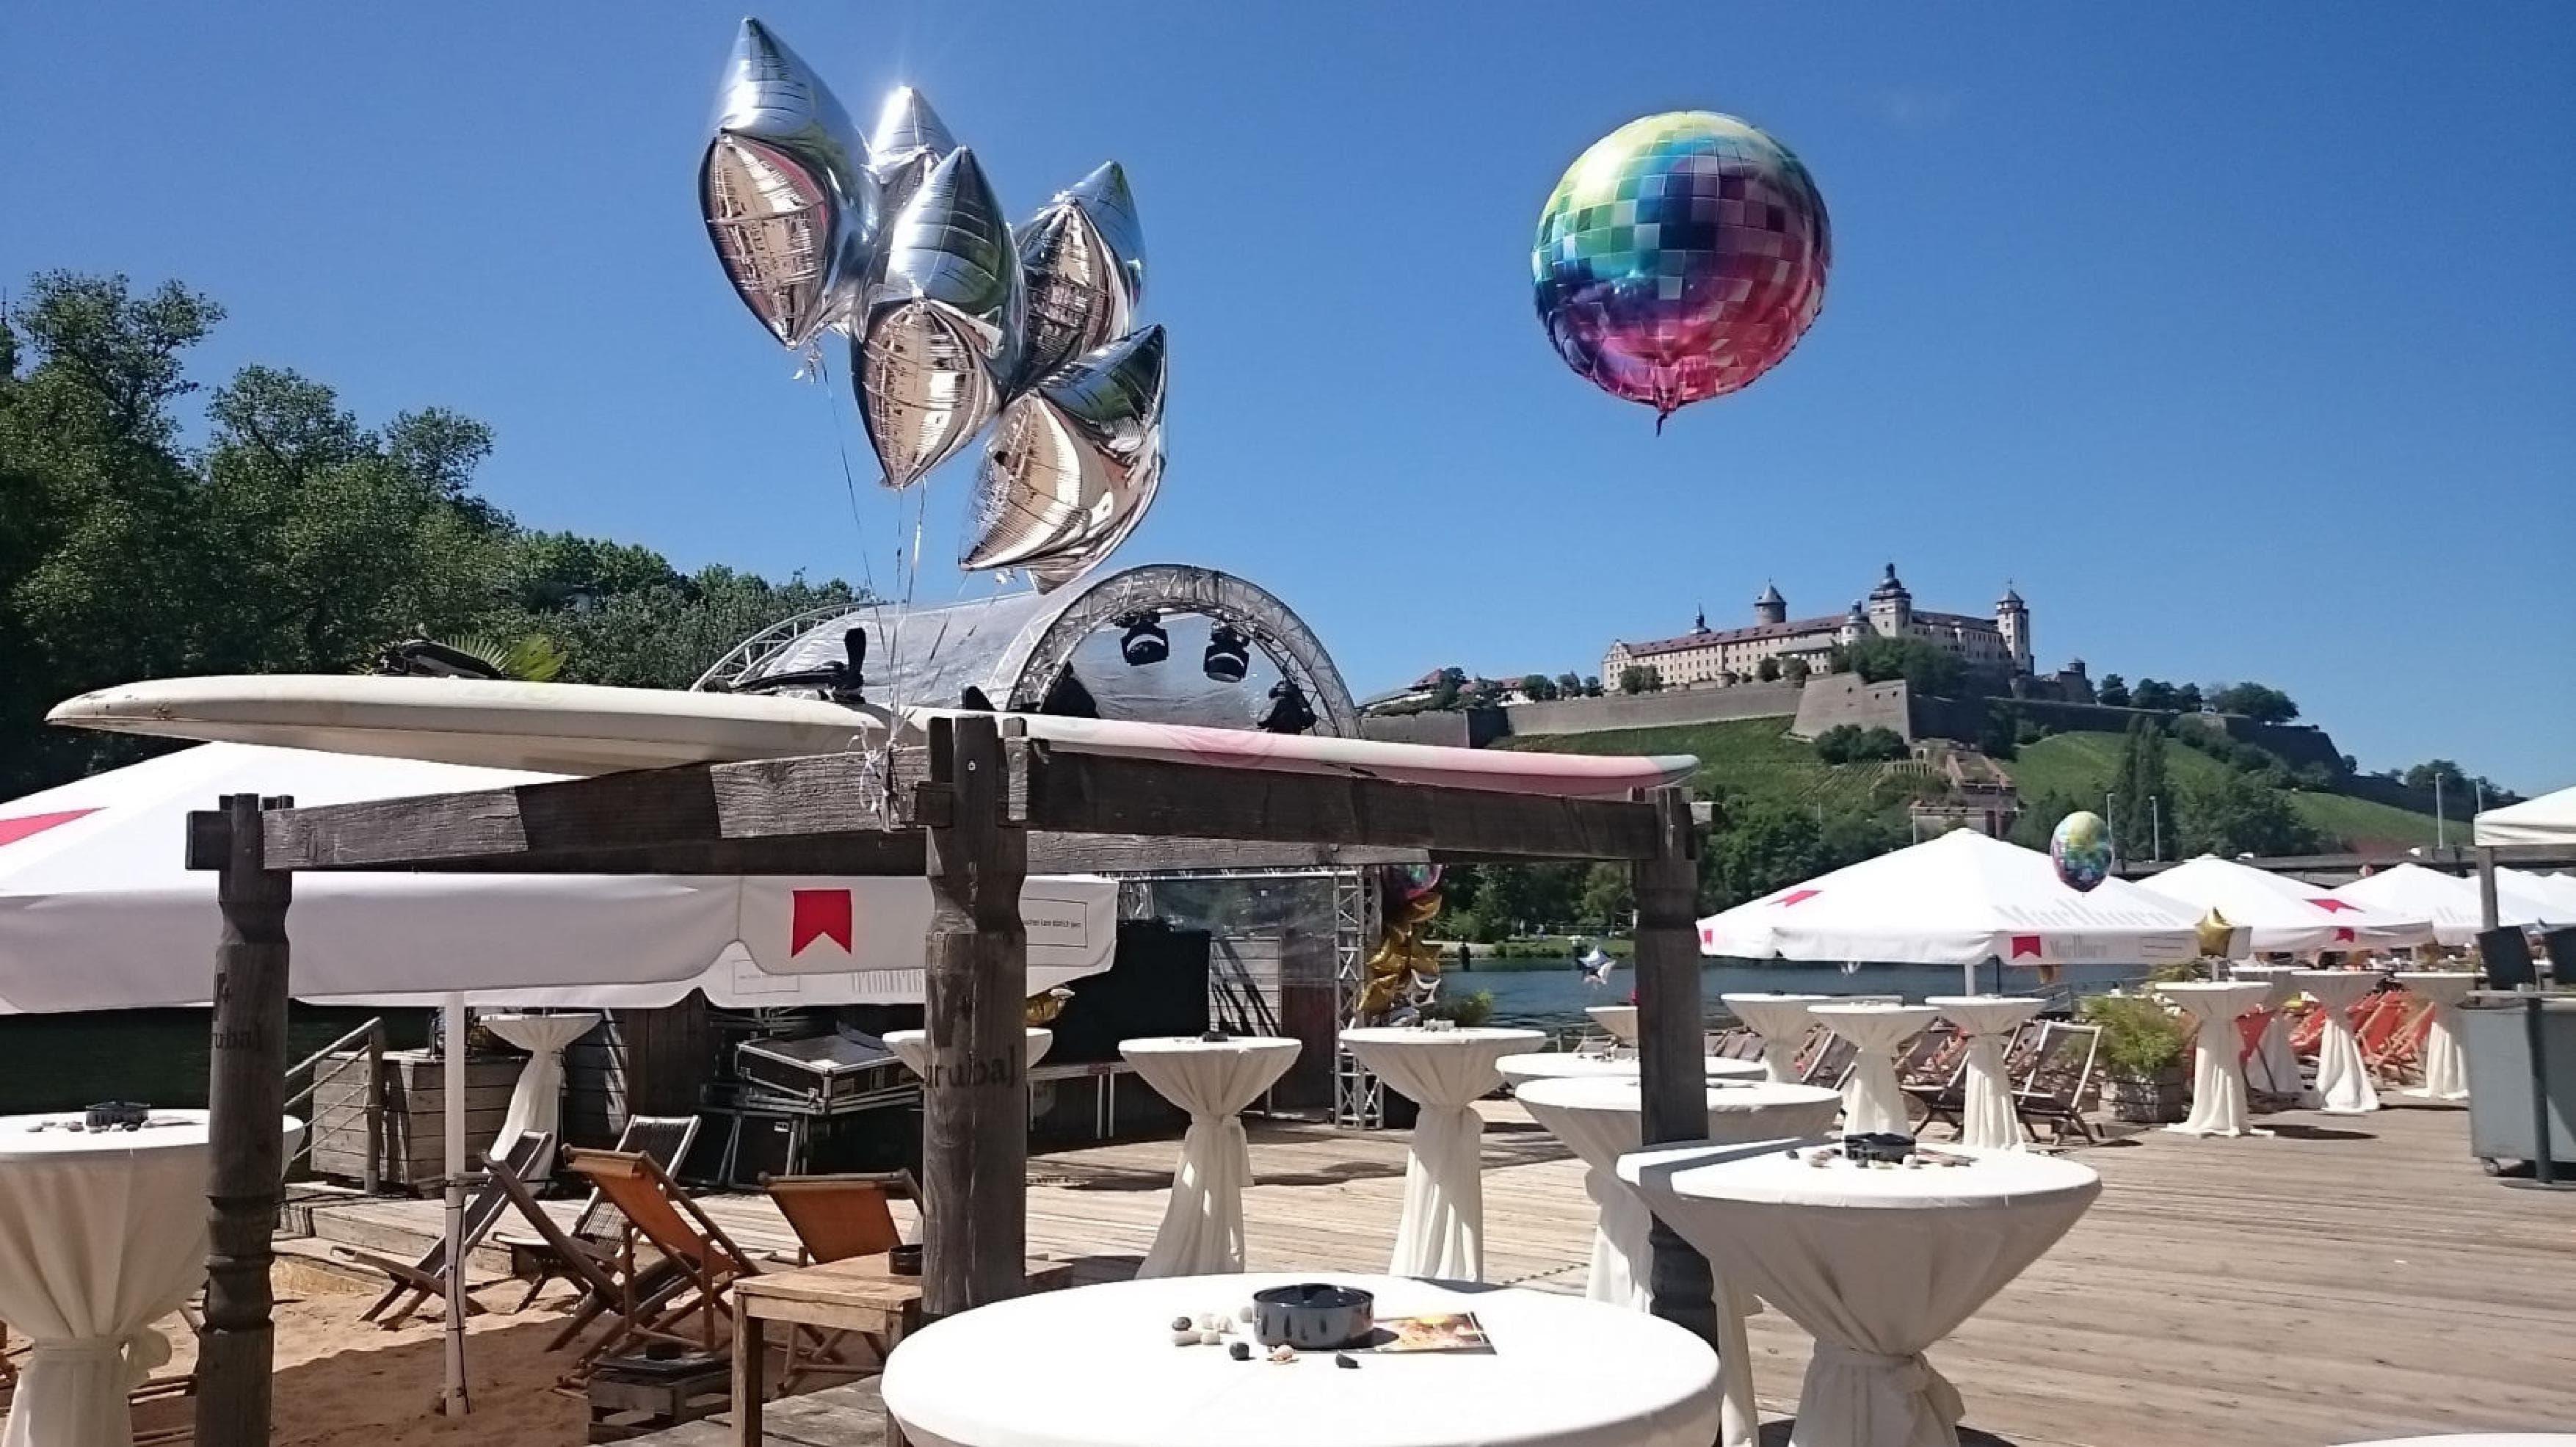 FestungballonsDjpult